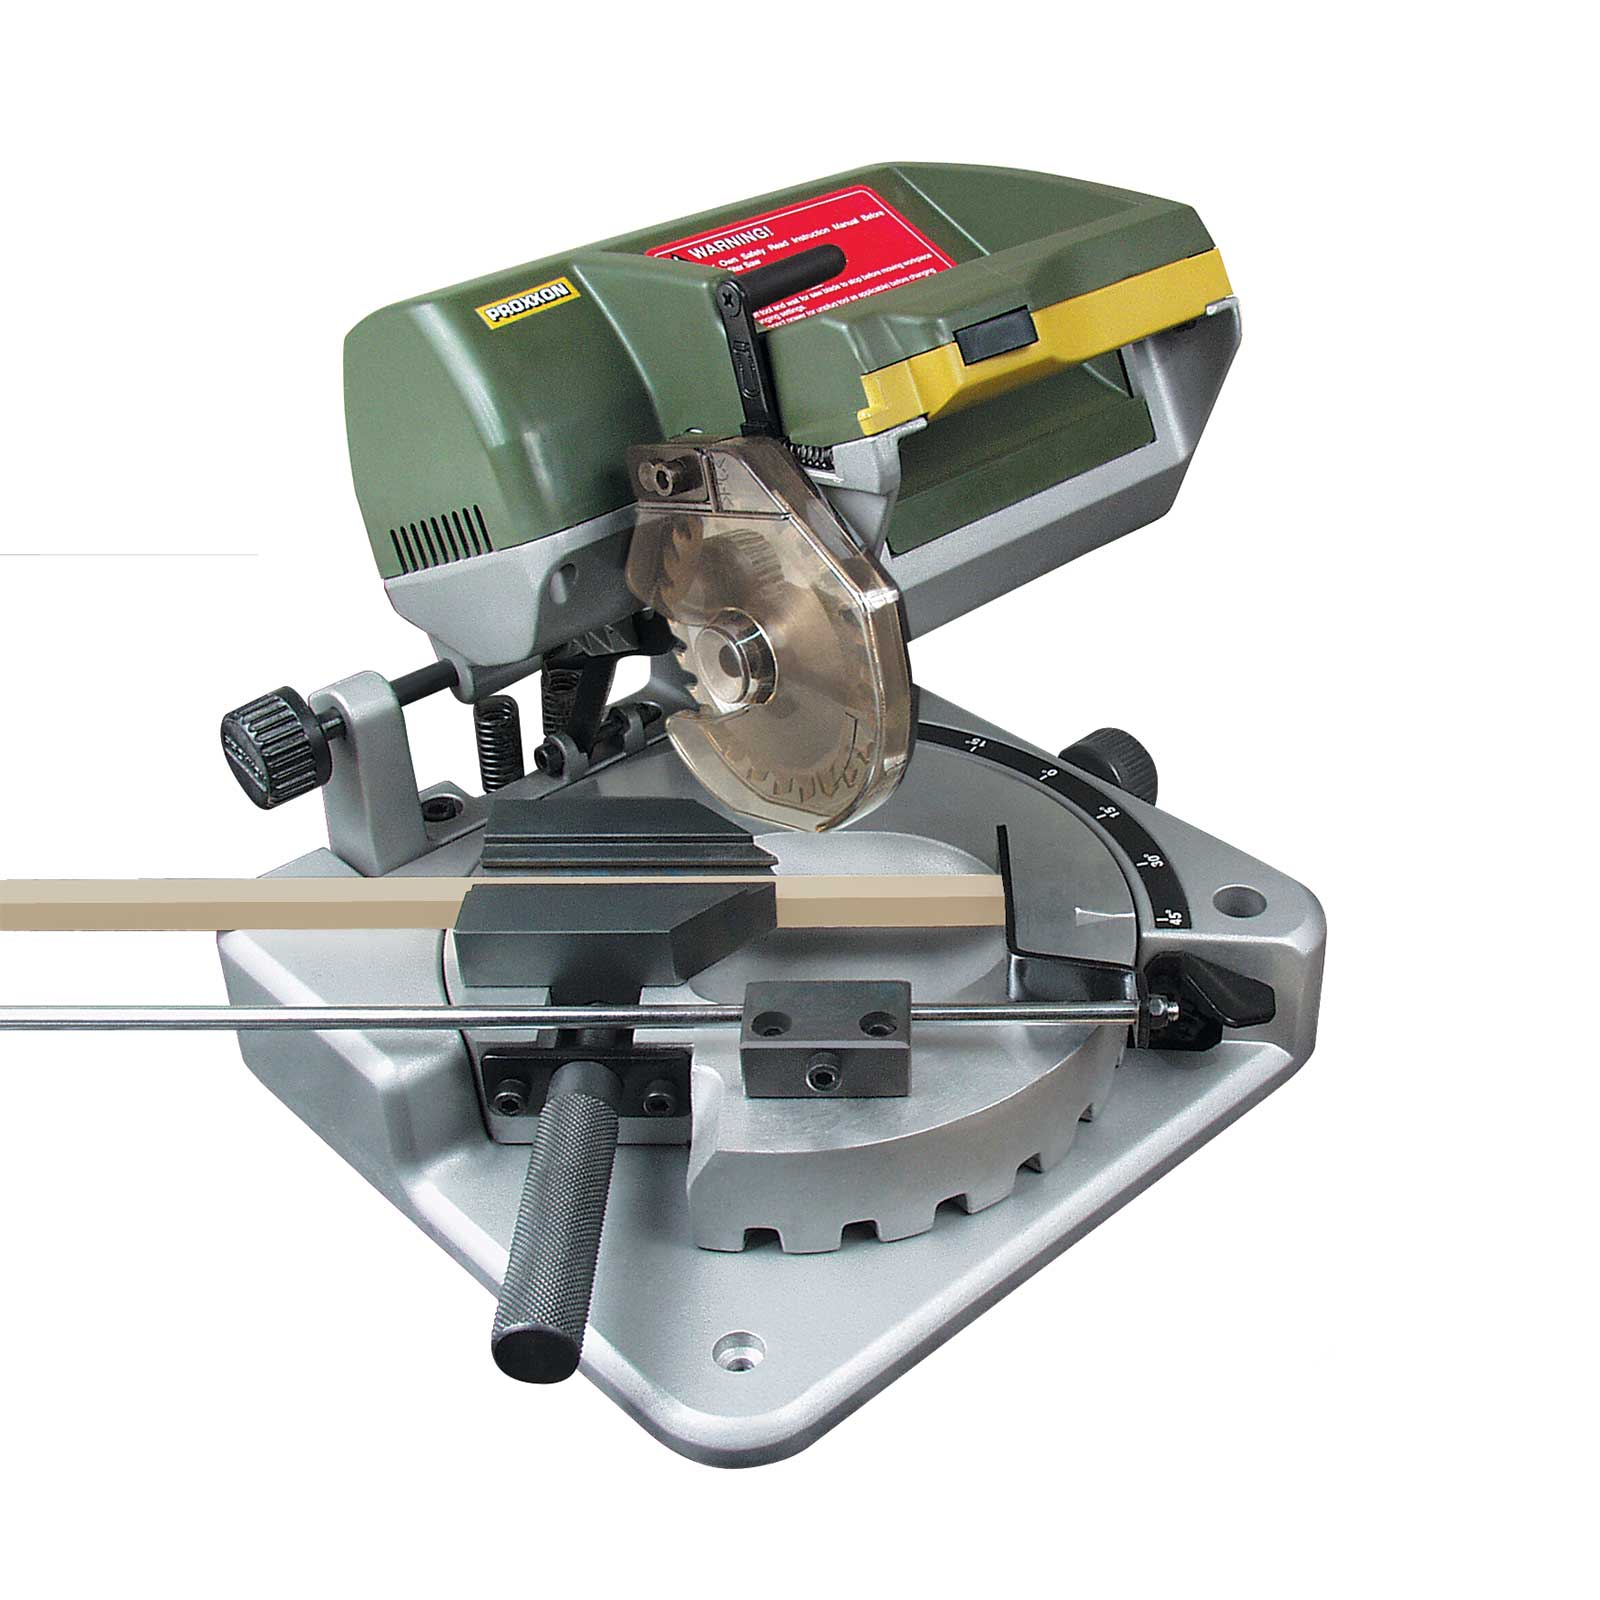 Proxxon Mini Chop Miter Saw For Hobby Use